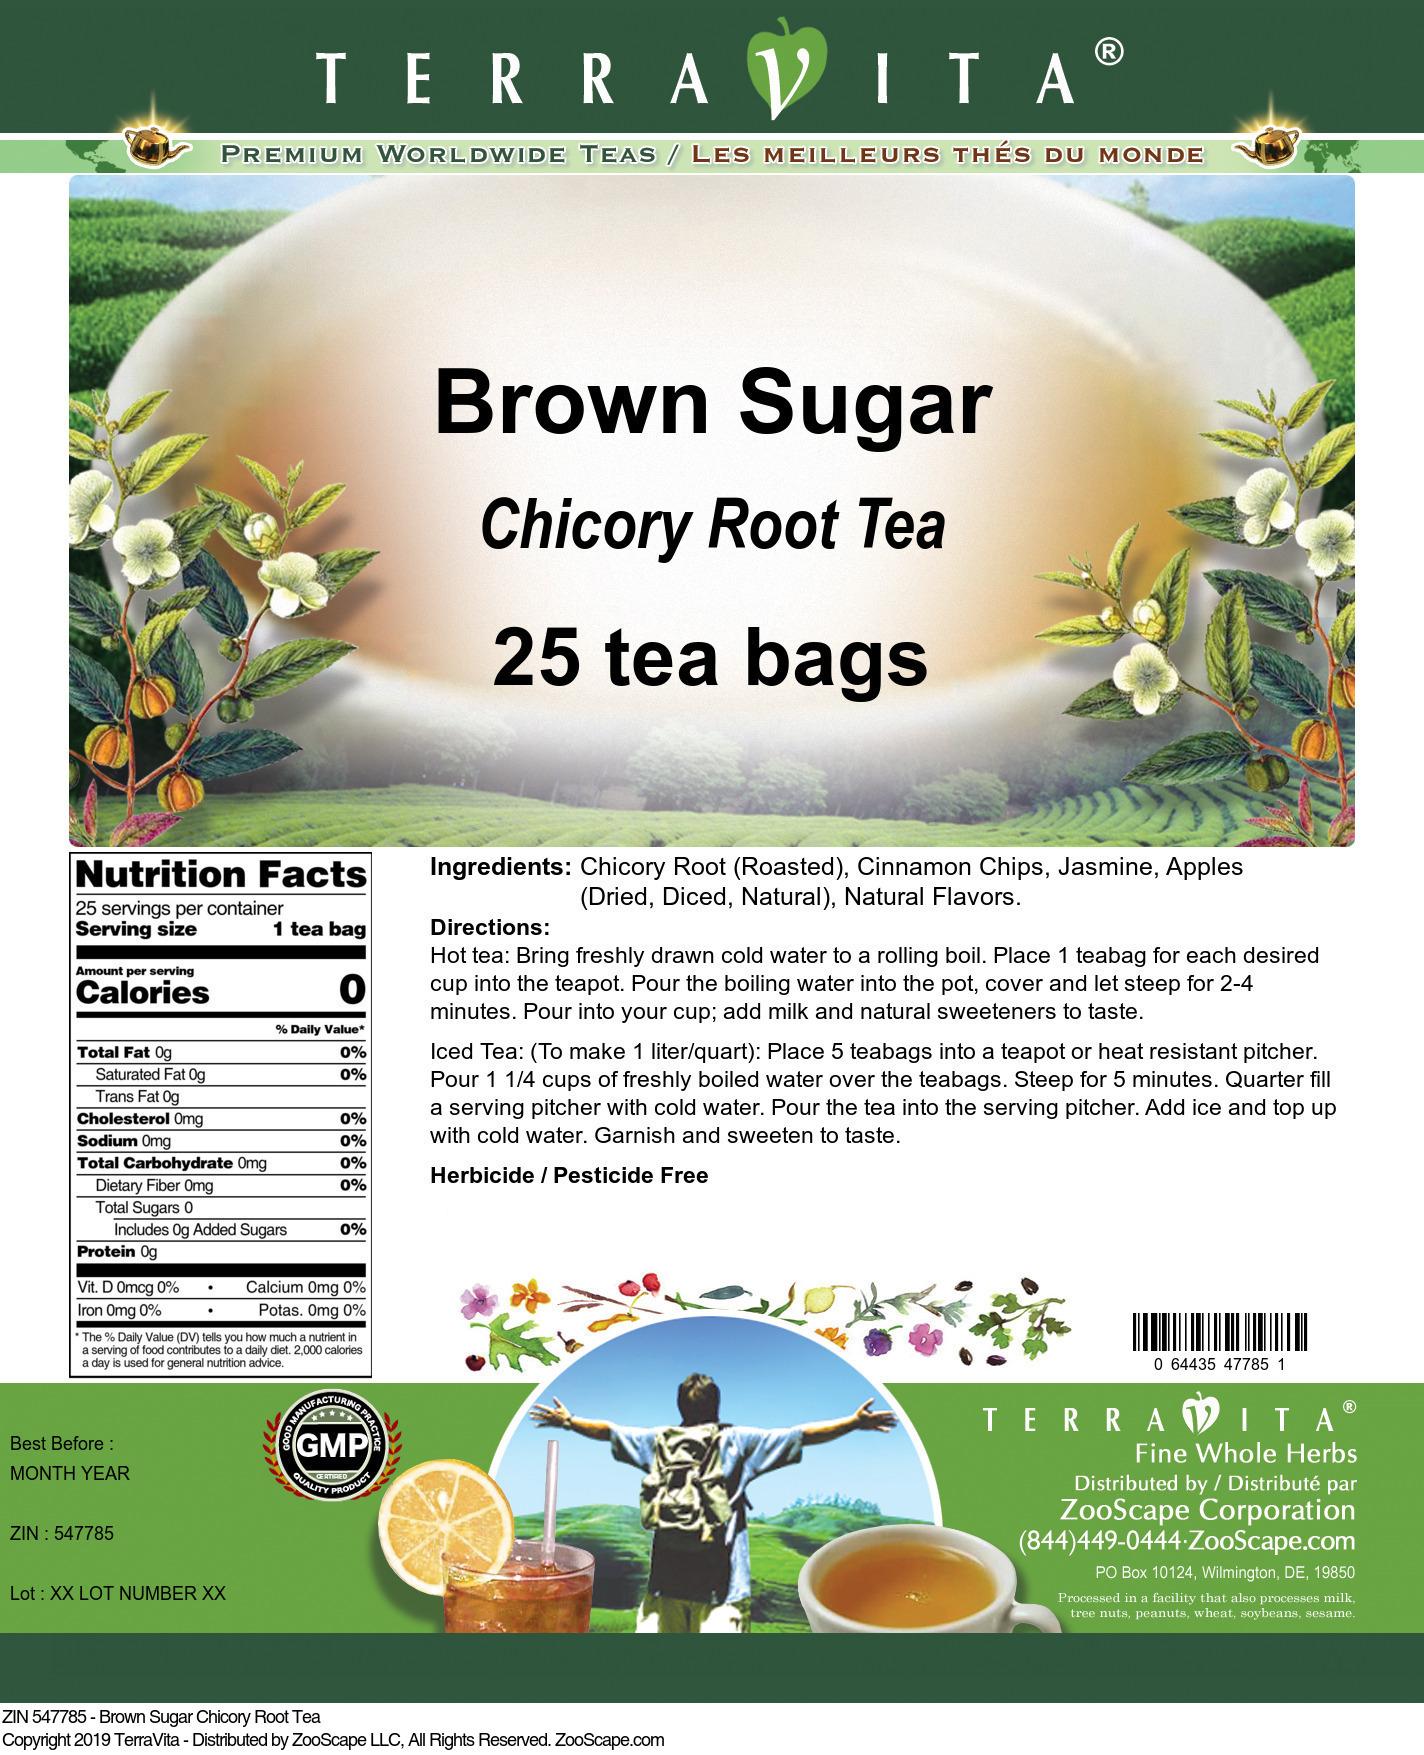 Brown Sugar Chicory Root Tea